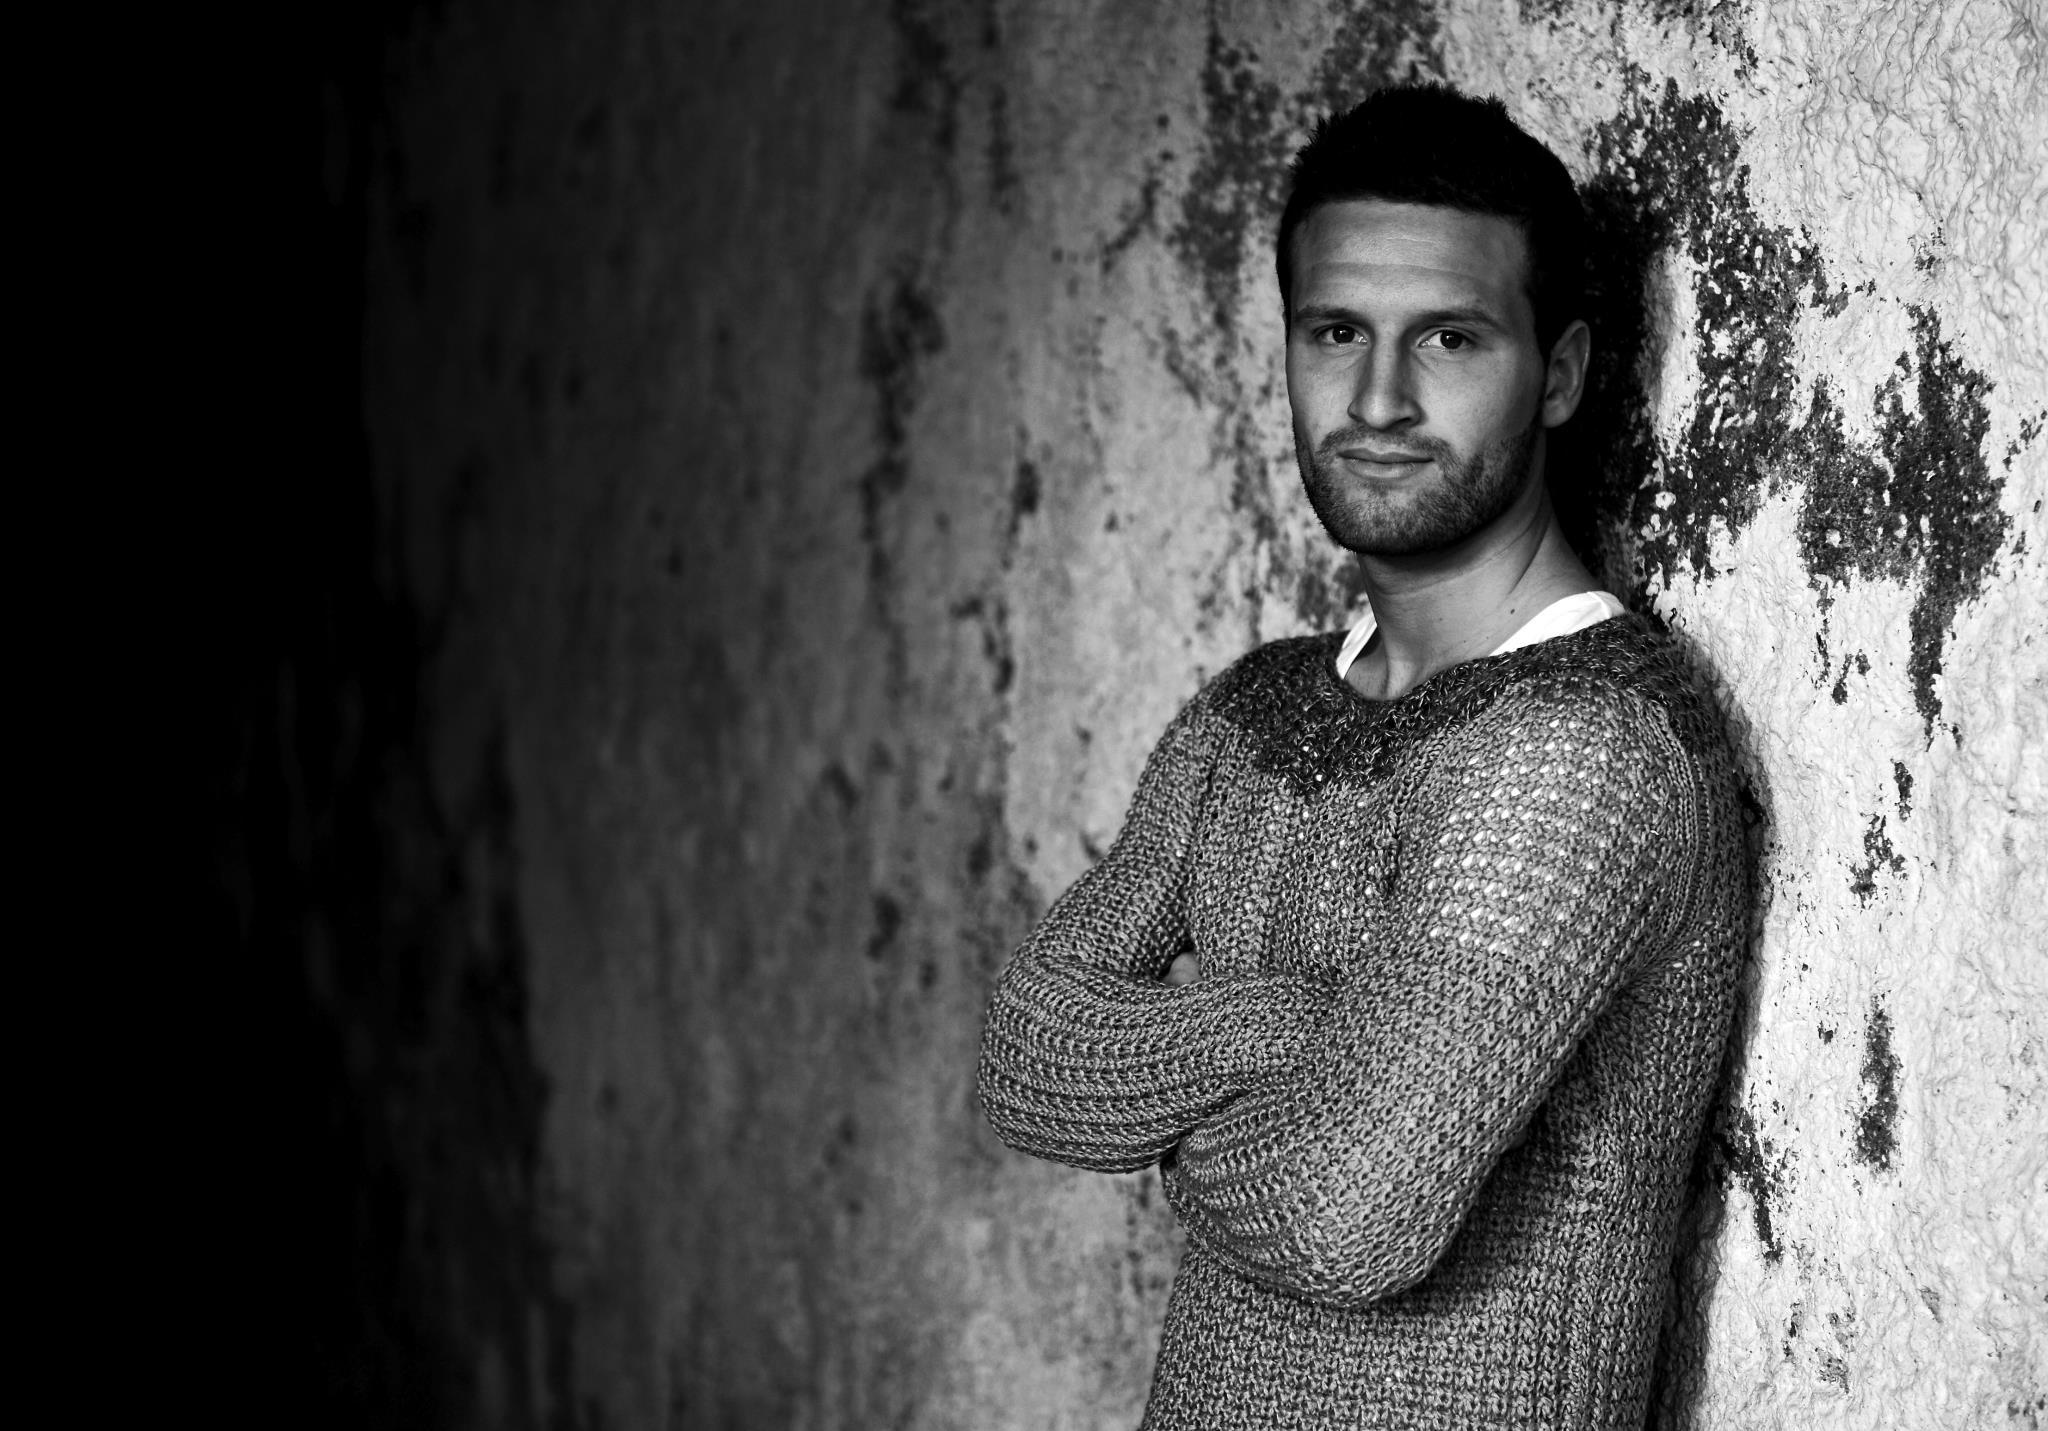 The Daily Drool – World Cup 2014 – Germany Shkodran Mustafi